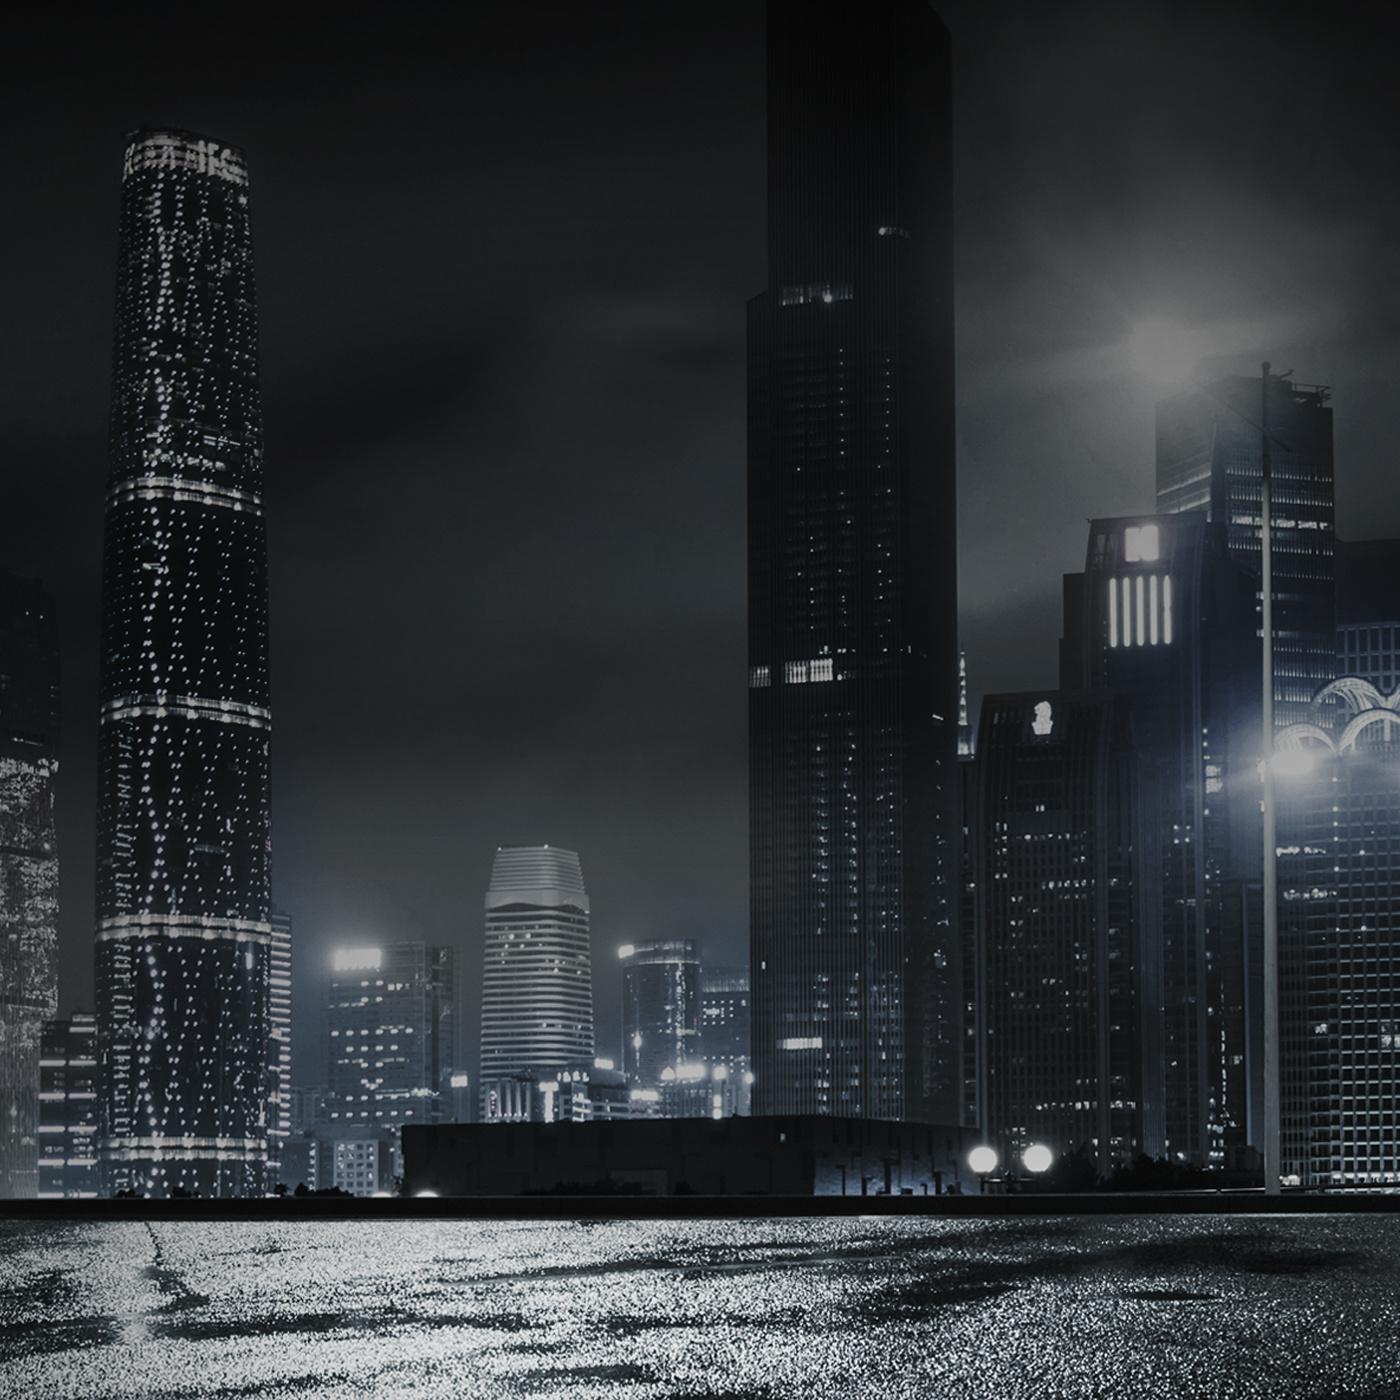 Moonlit Nighttime Cityscape